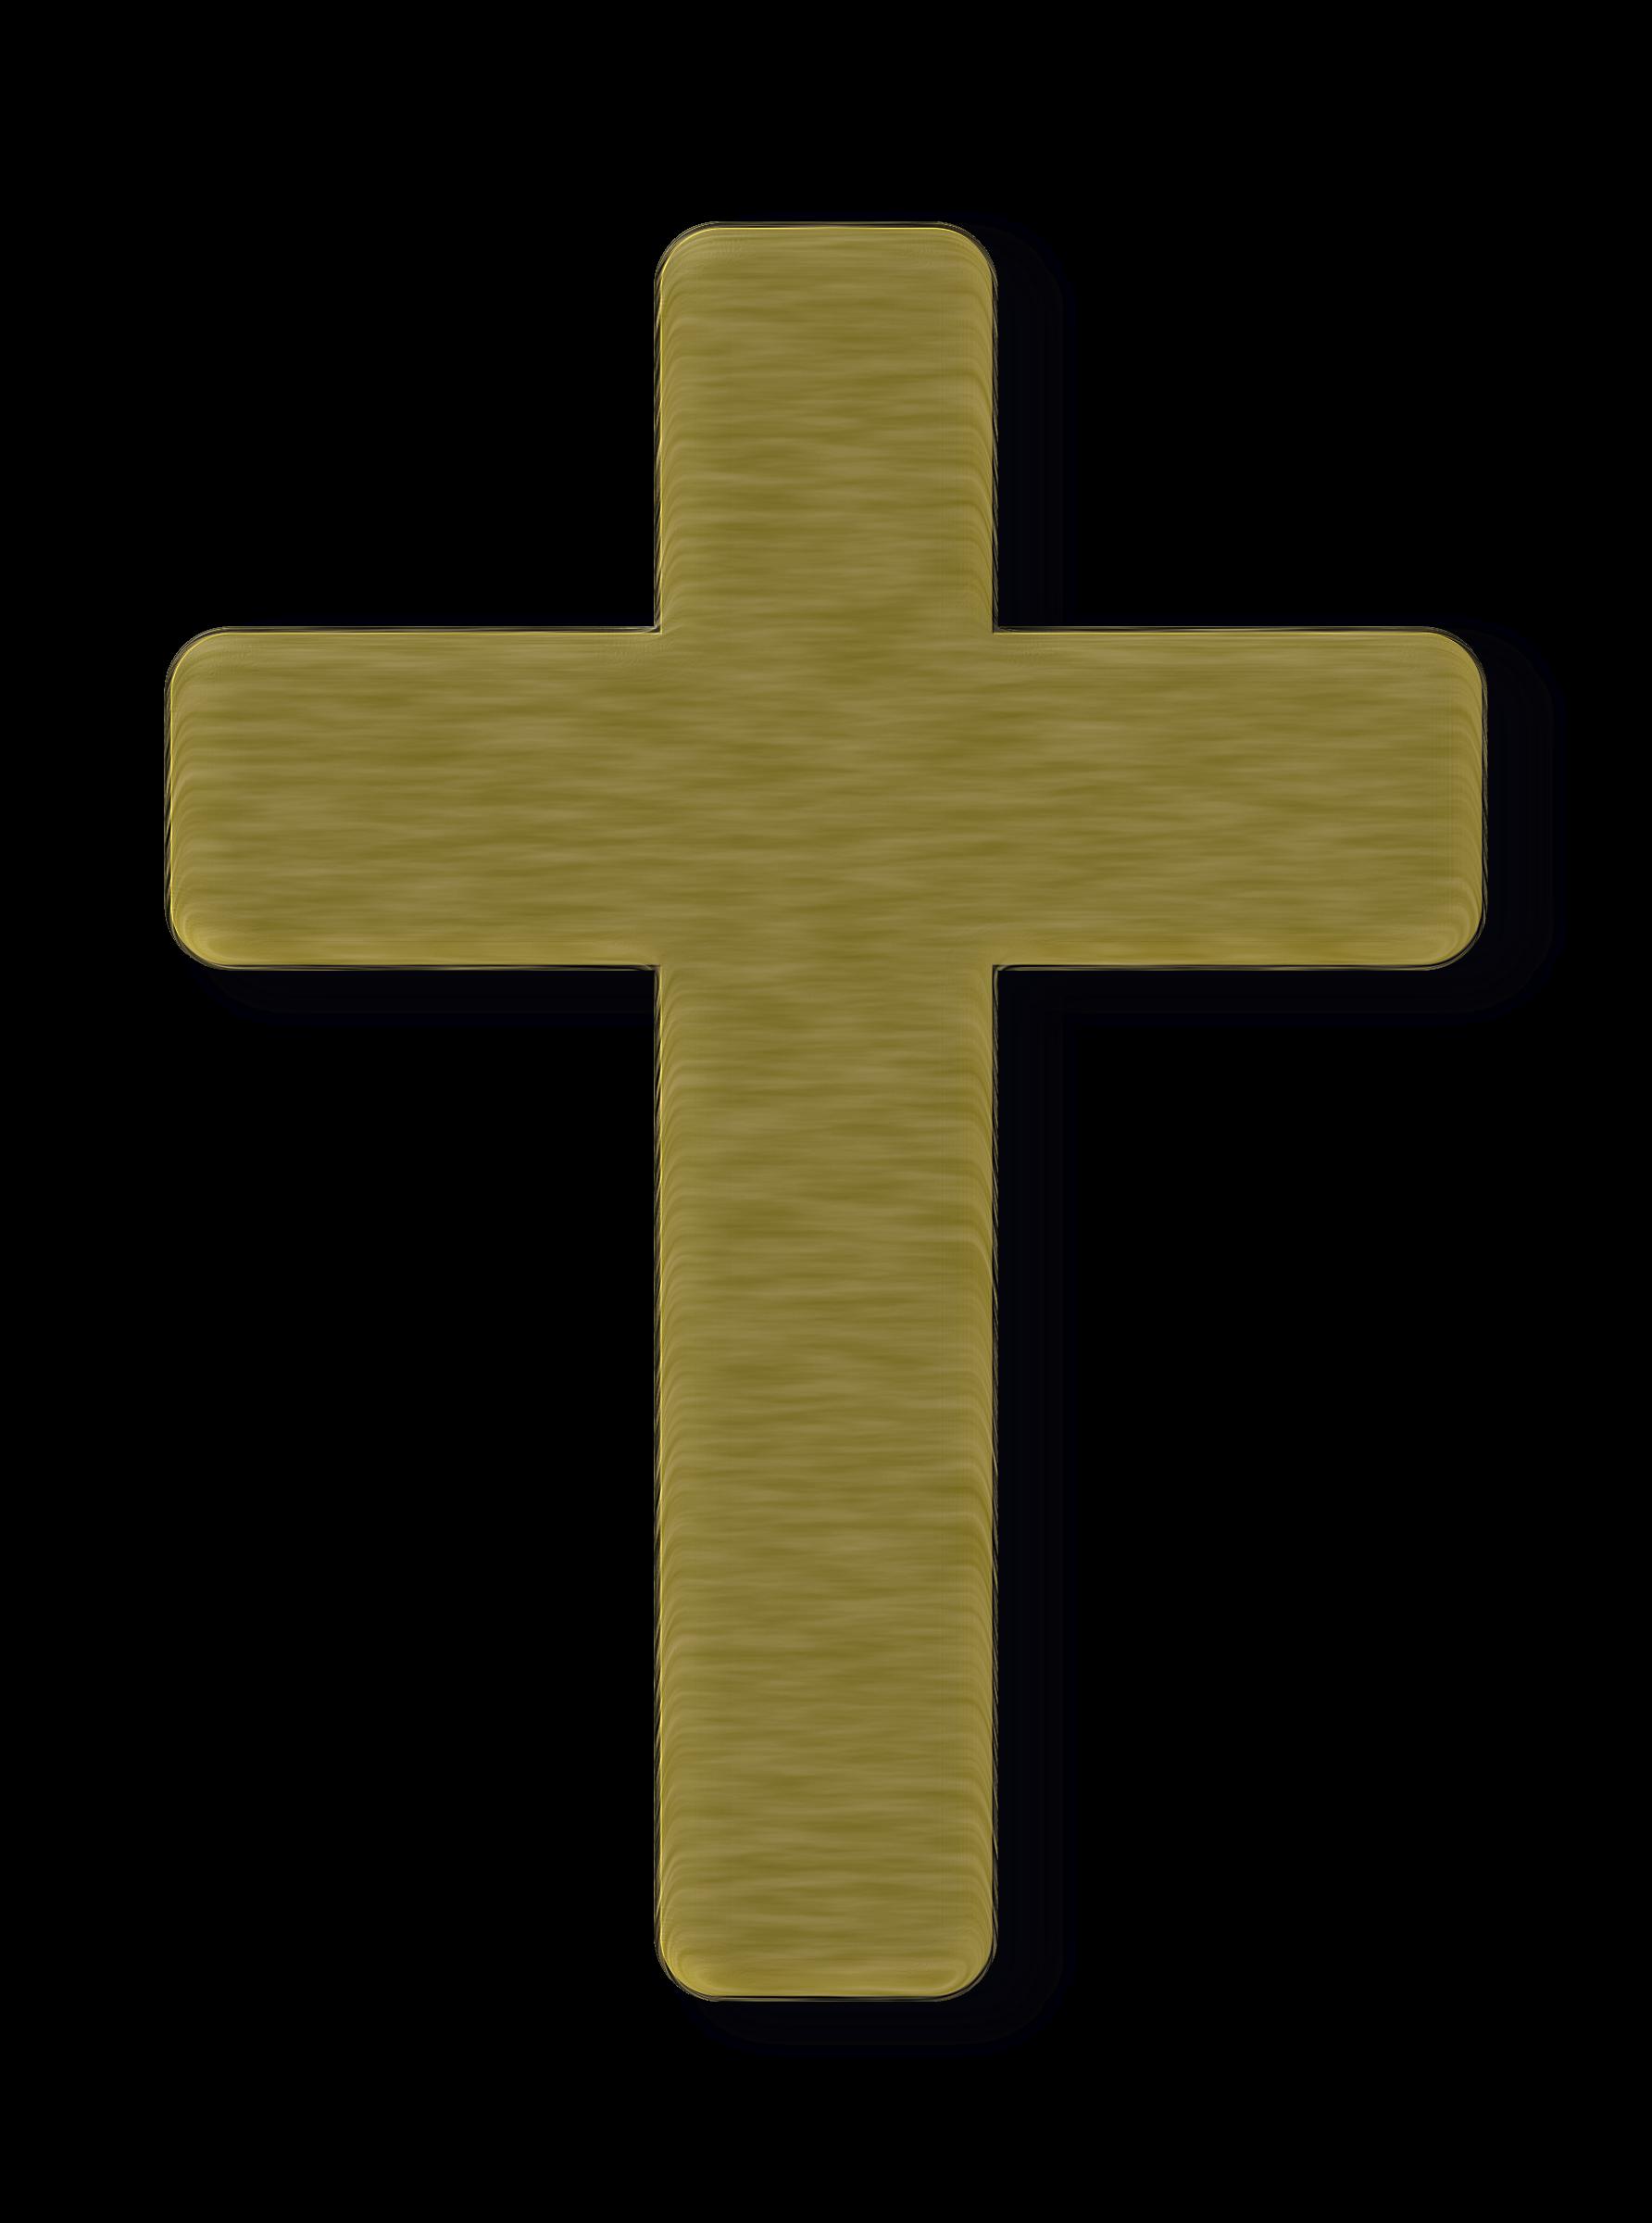 Crucifix clipart shadow. Genma cross big image